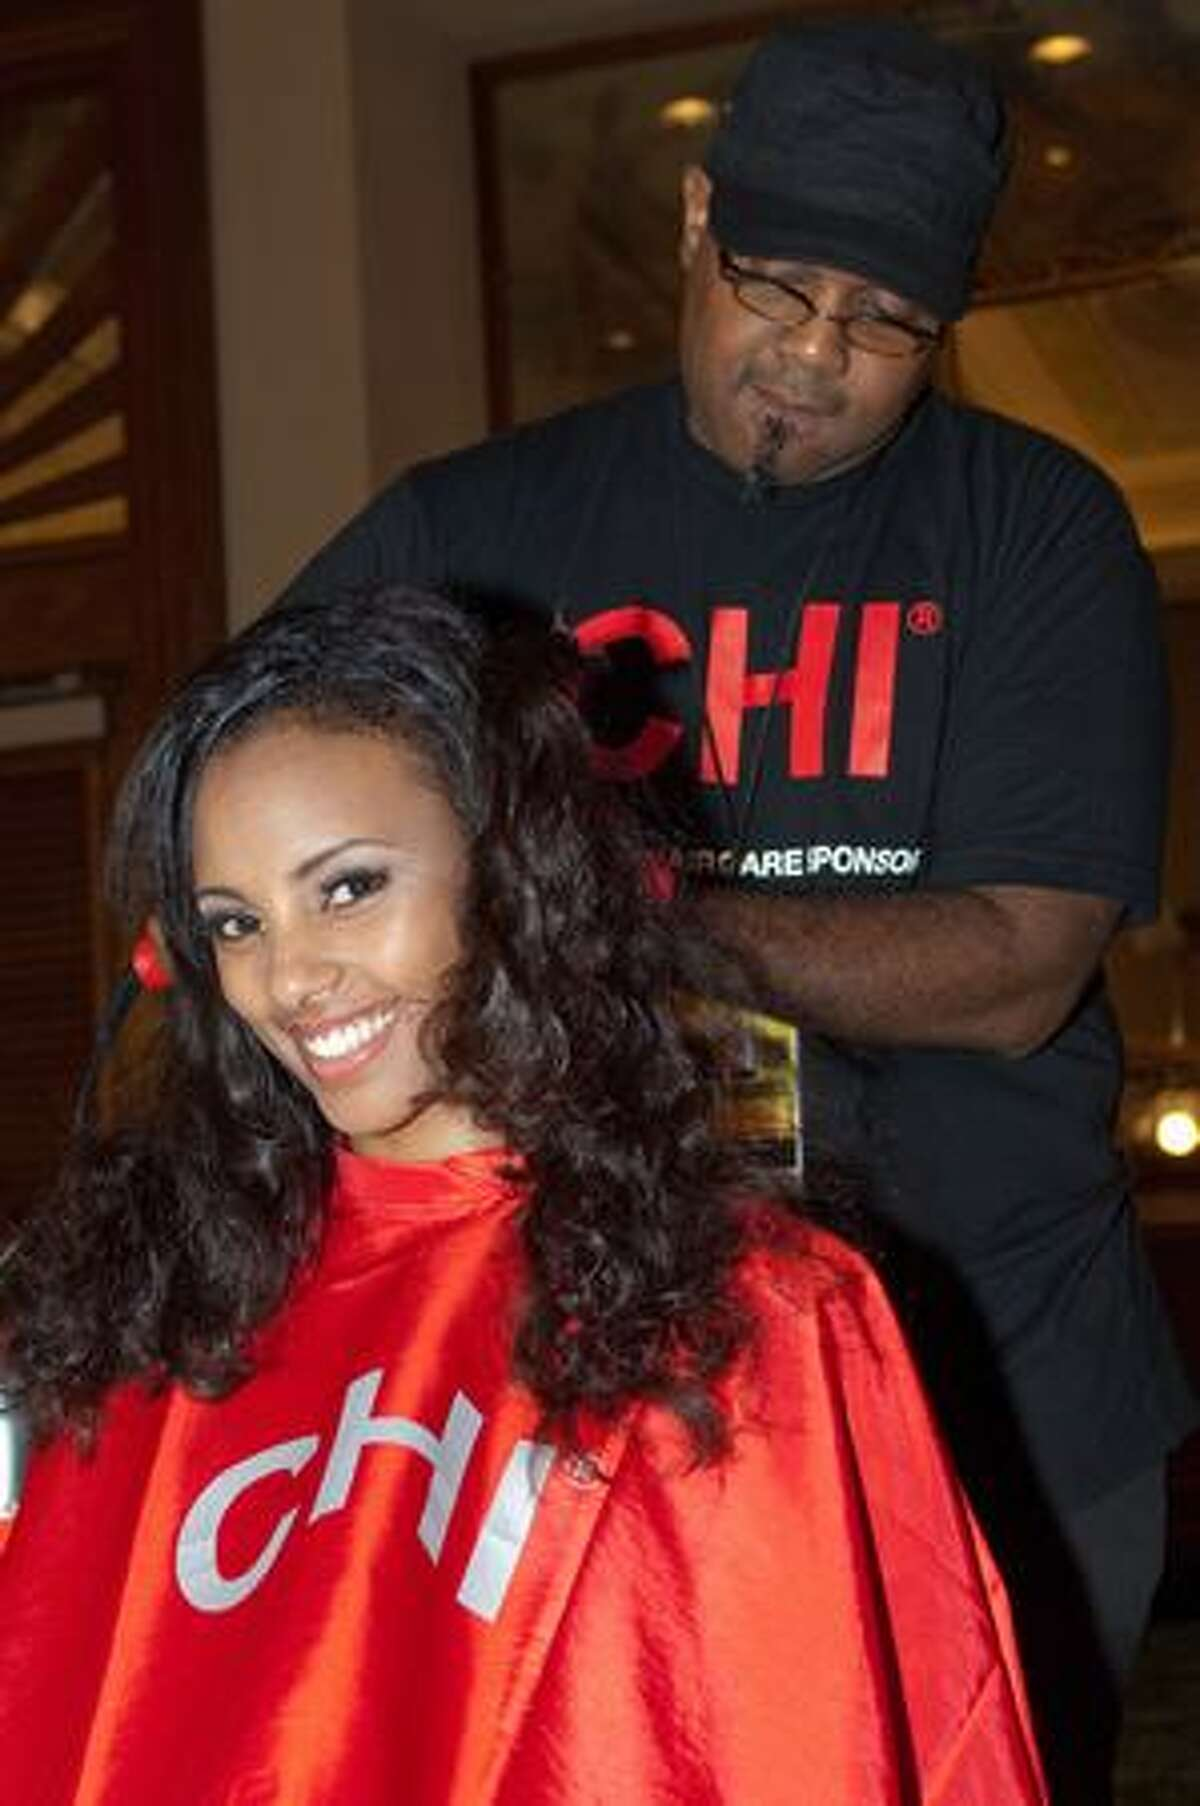 Hairstylist Arthuro Gray works with Melat Yante, Miss Ethiopia.